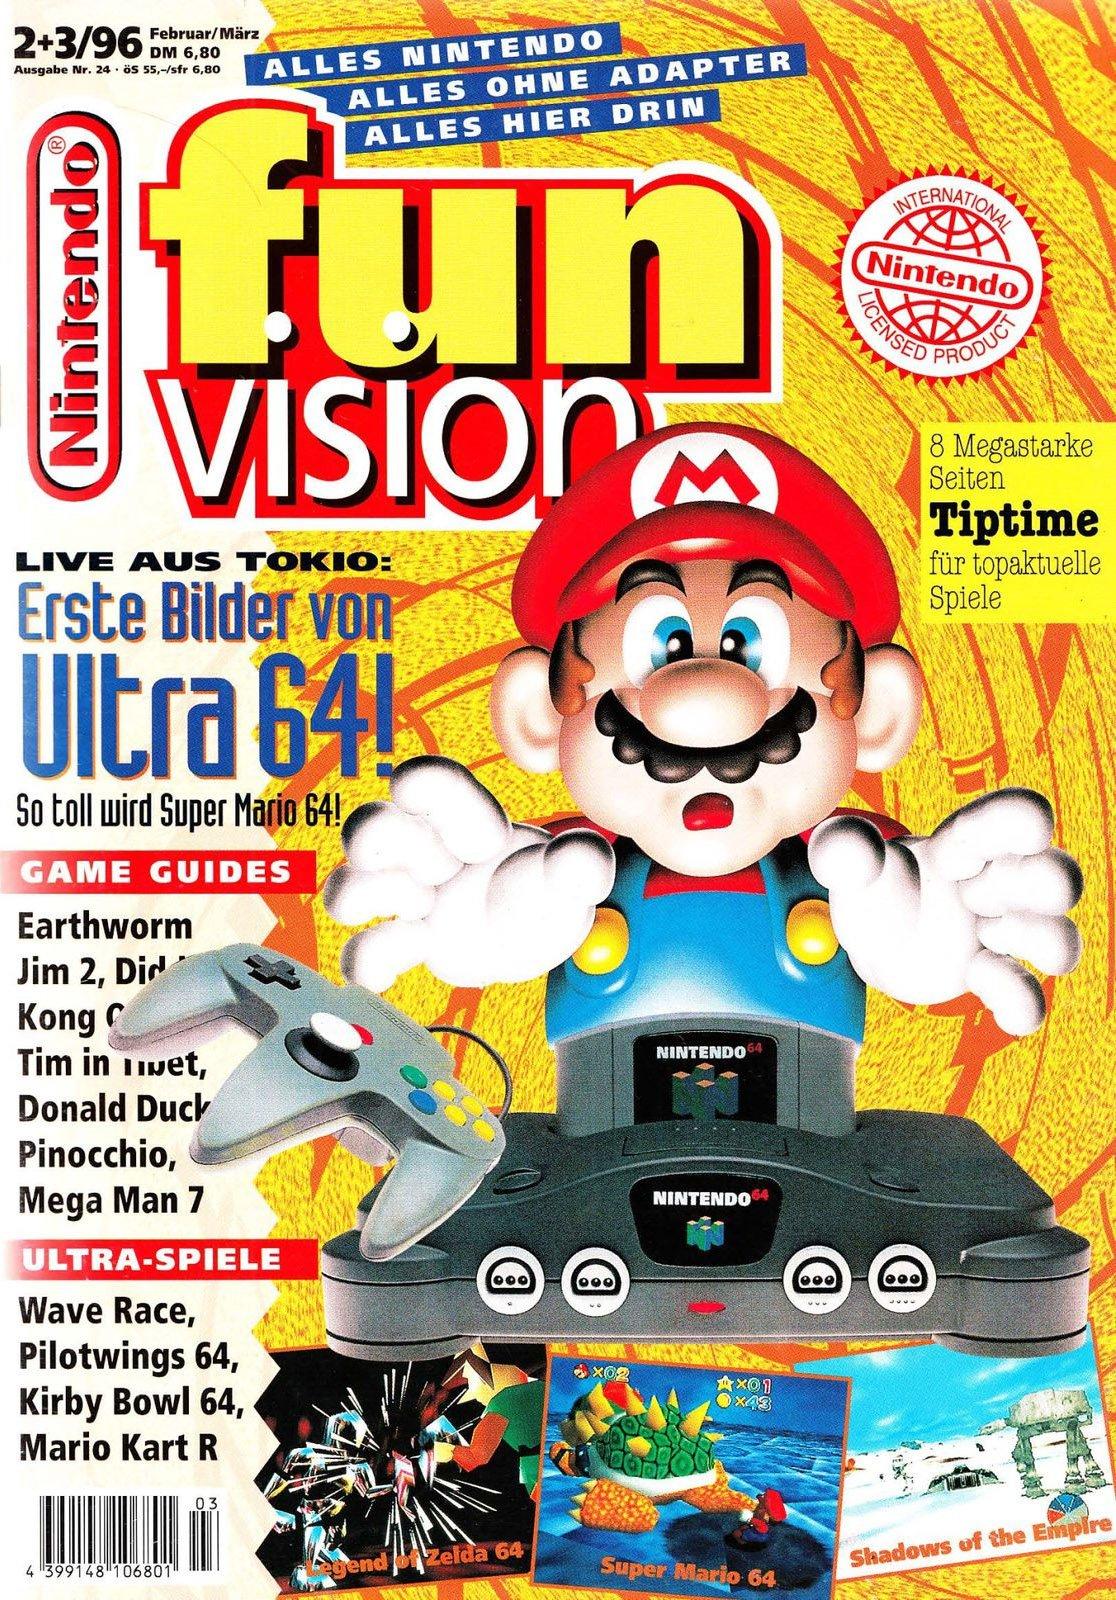 Nintendo Fun Vision Issue 24 (February 1996)